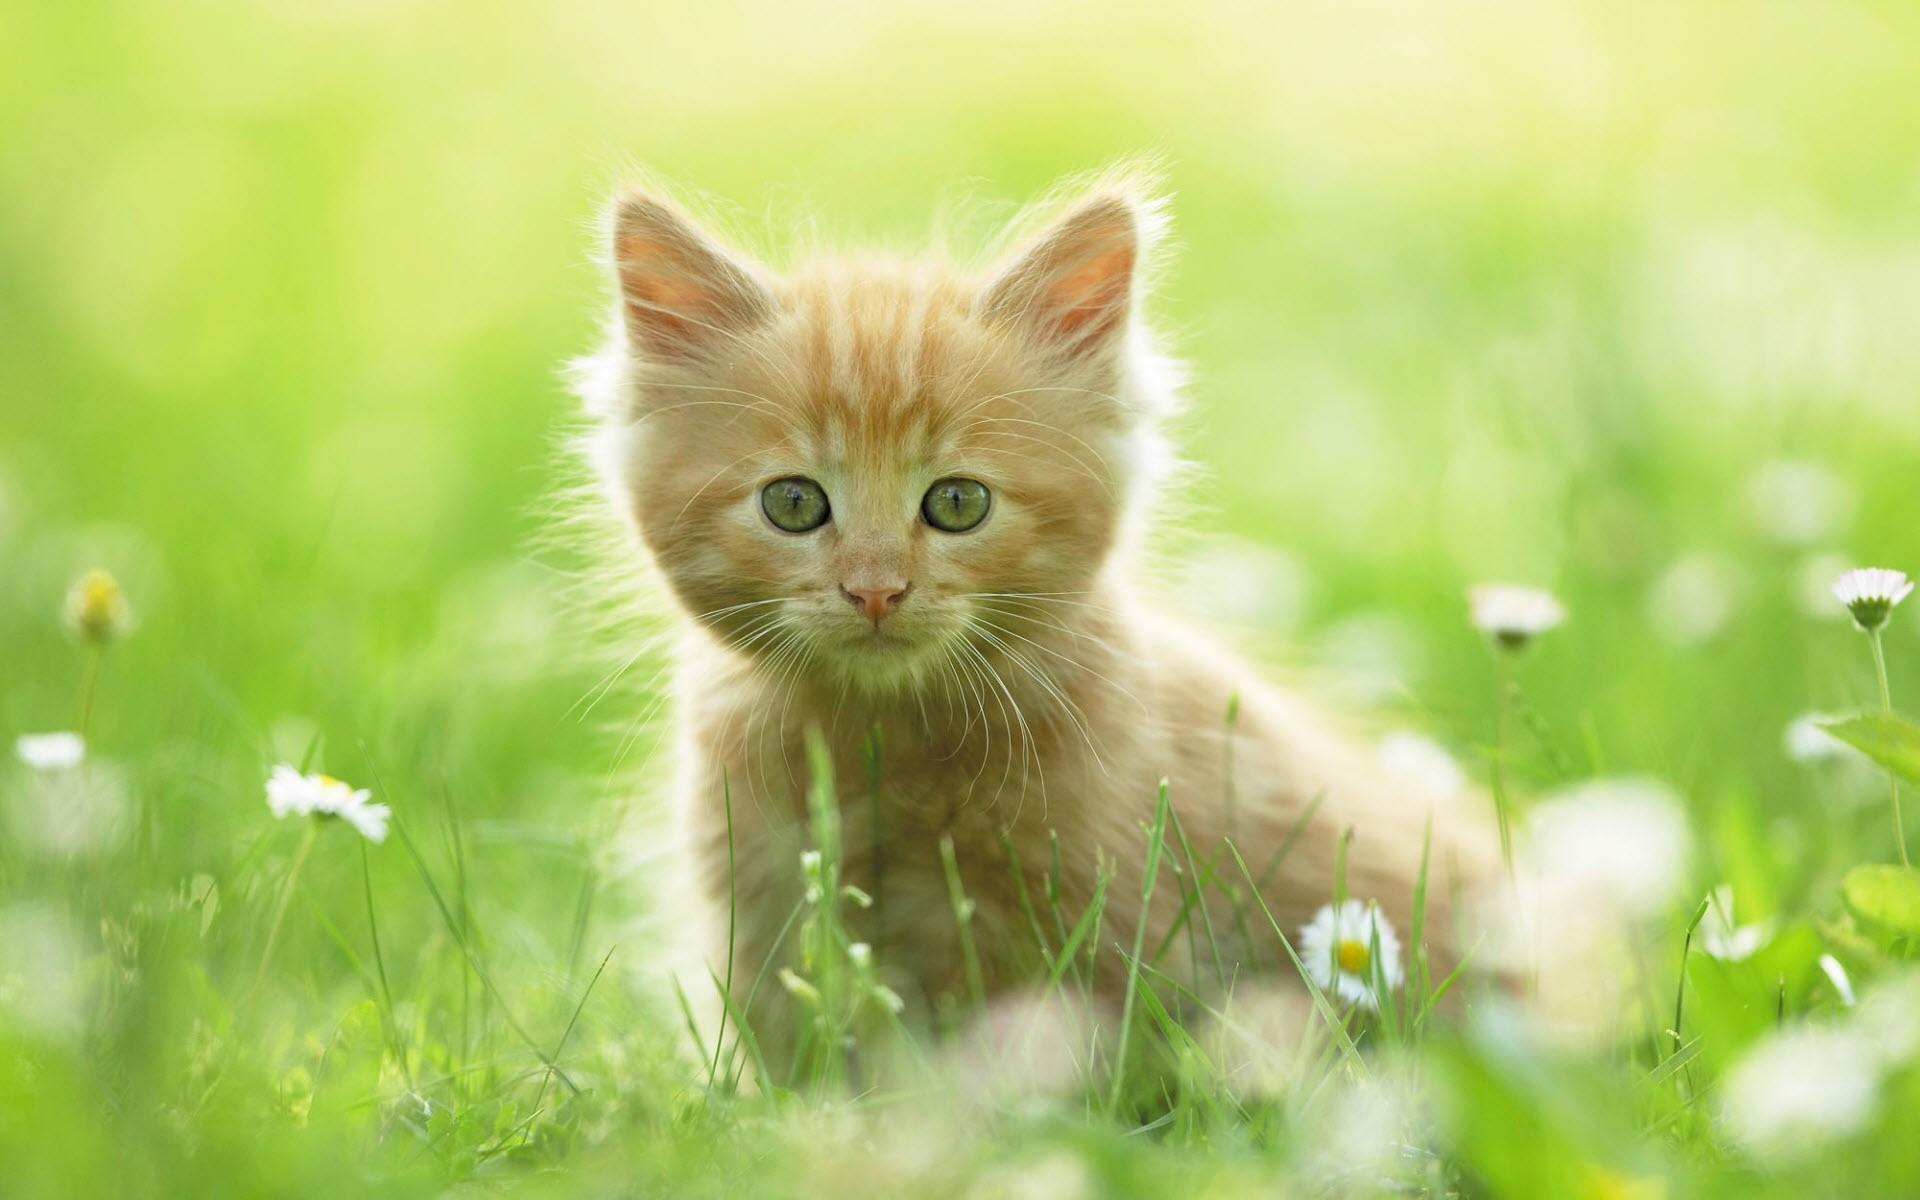 2400x1800 Beautiful Creative Cute Persian Kitty Kitten With Flowers Hd Wallpaper Desktop